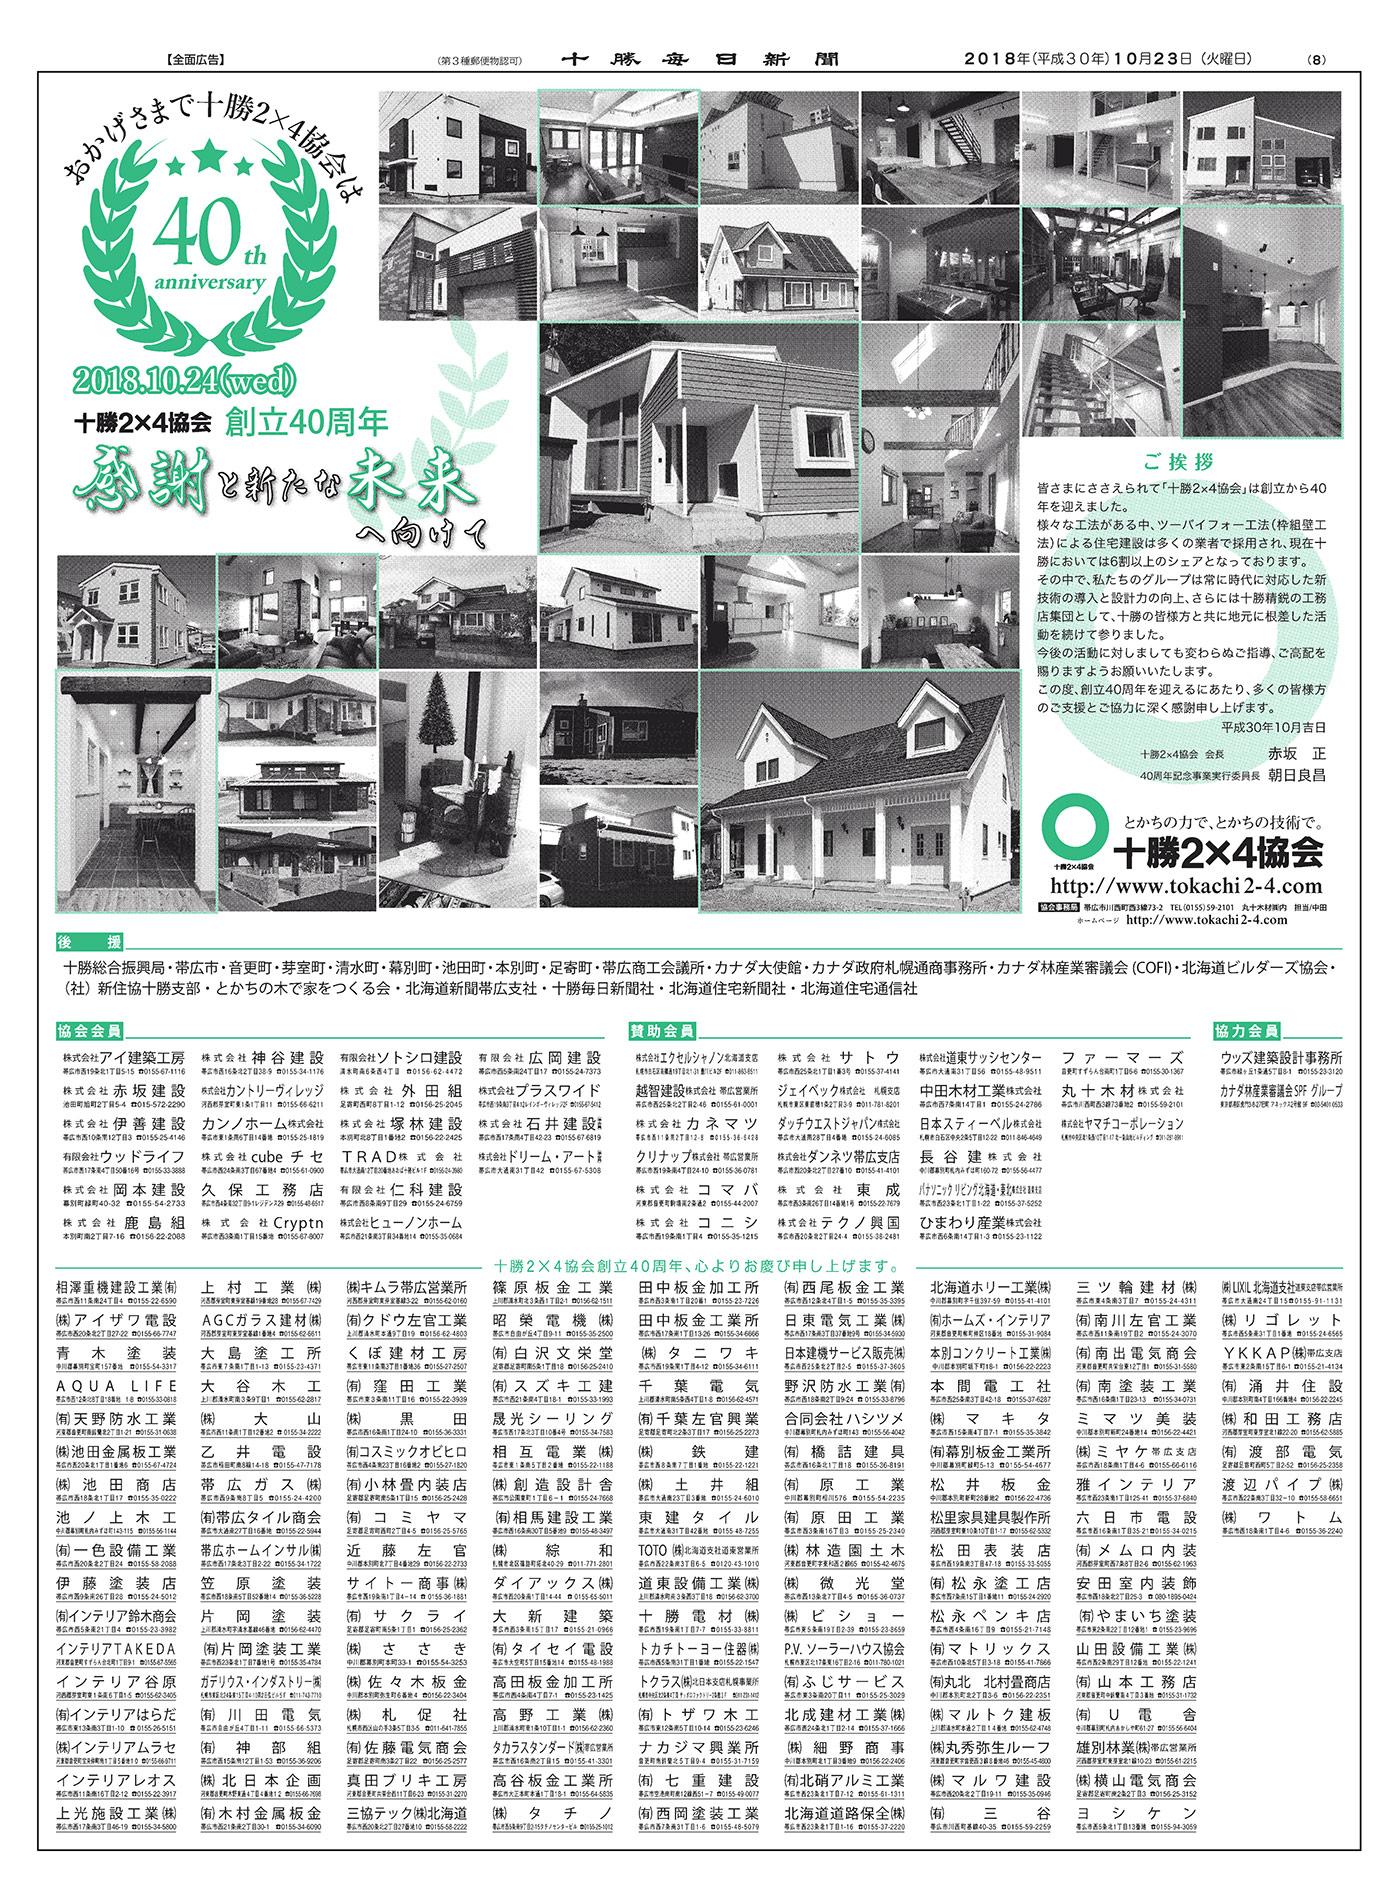 https://www.tokachi2-4.com/weblog/images/181023_kachimai_ad.jpg